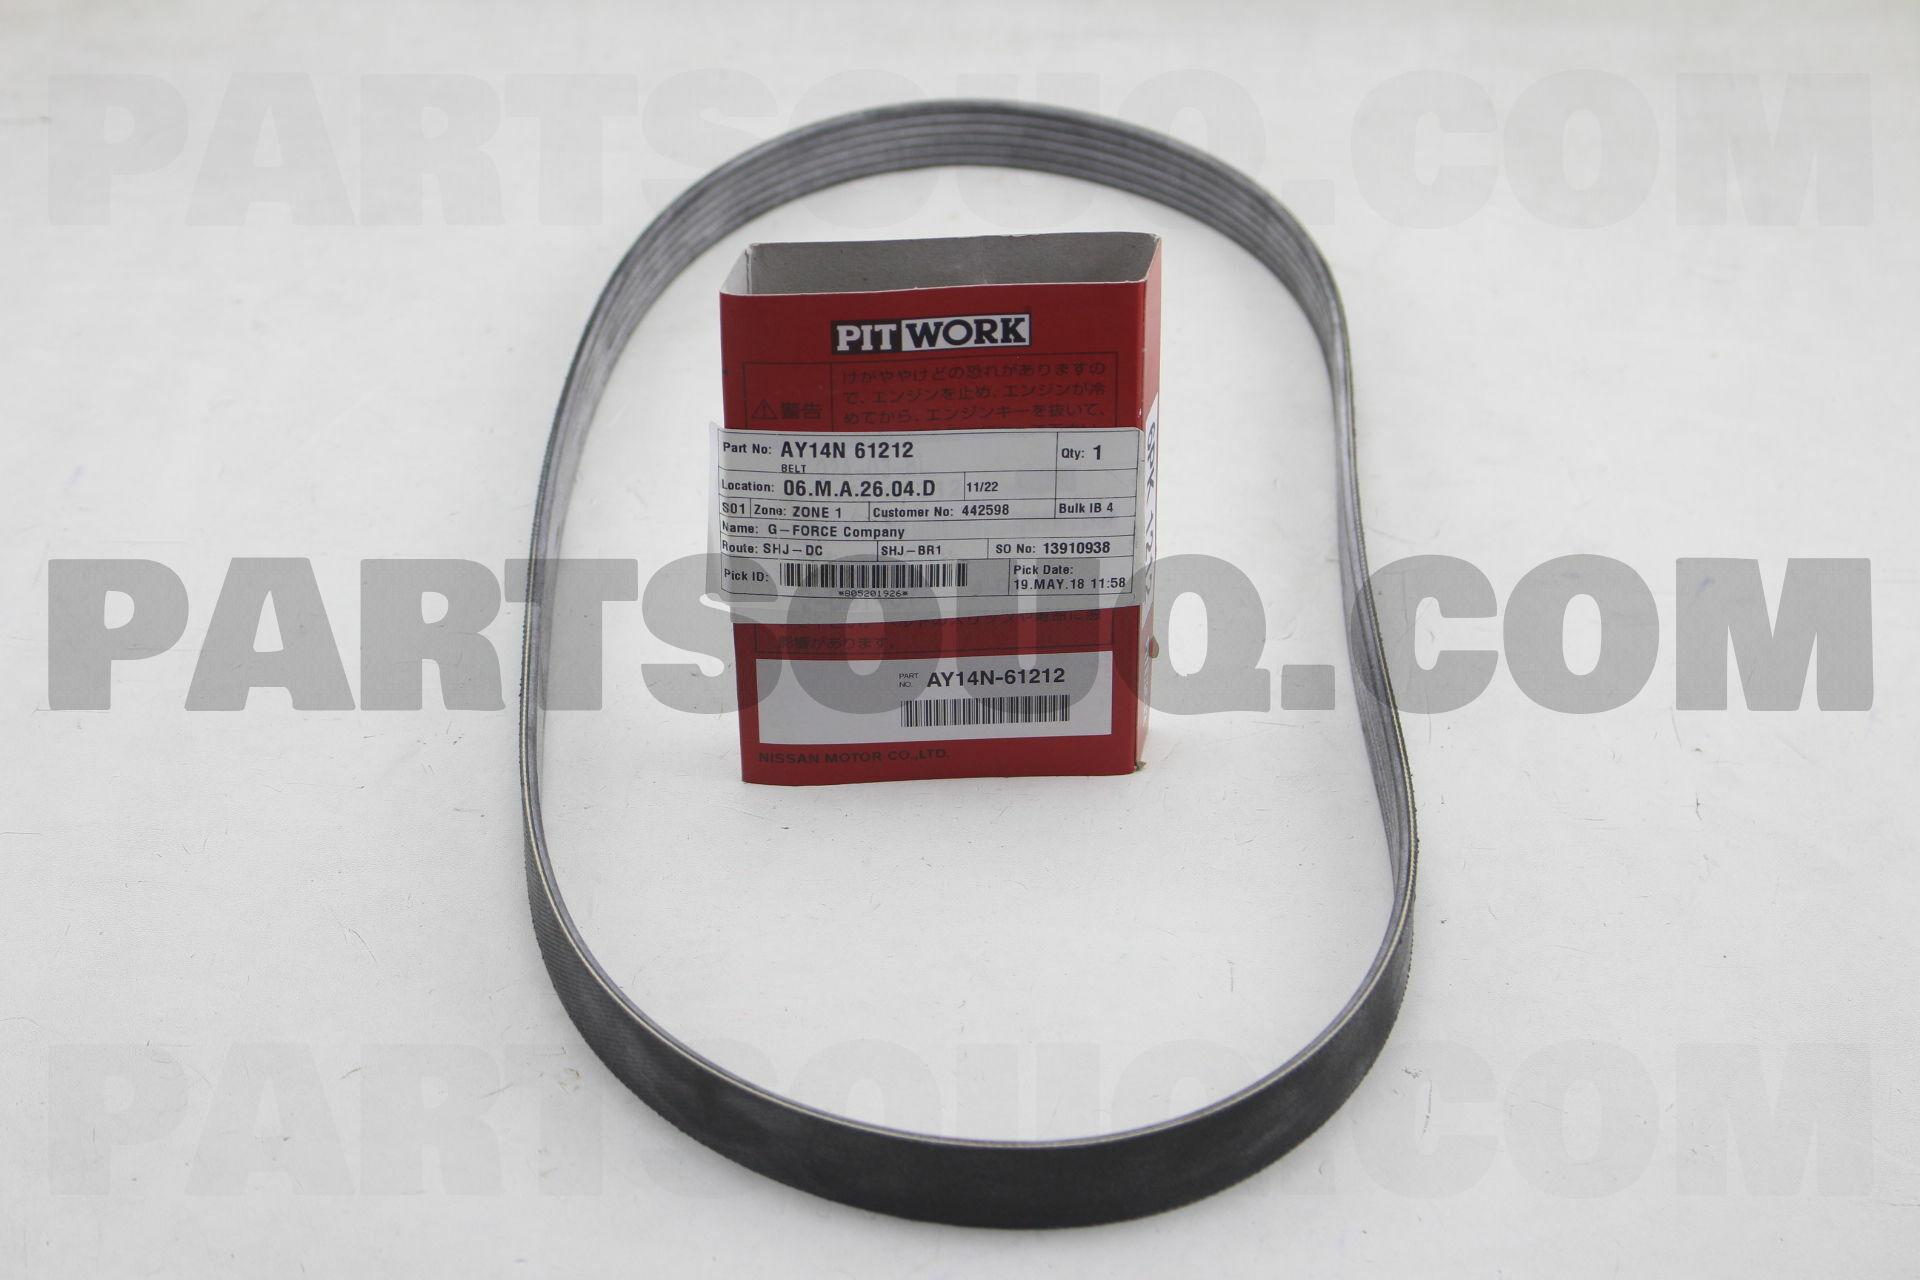 Belt Ay14n61212 Nissan Parts Partsouq